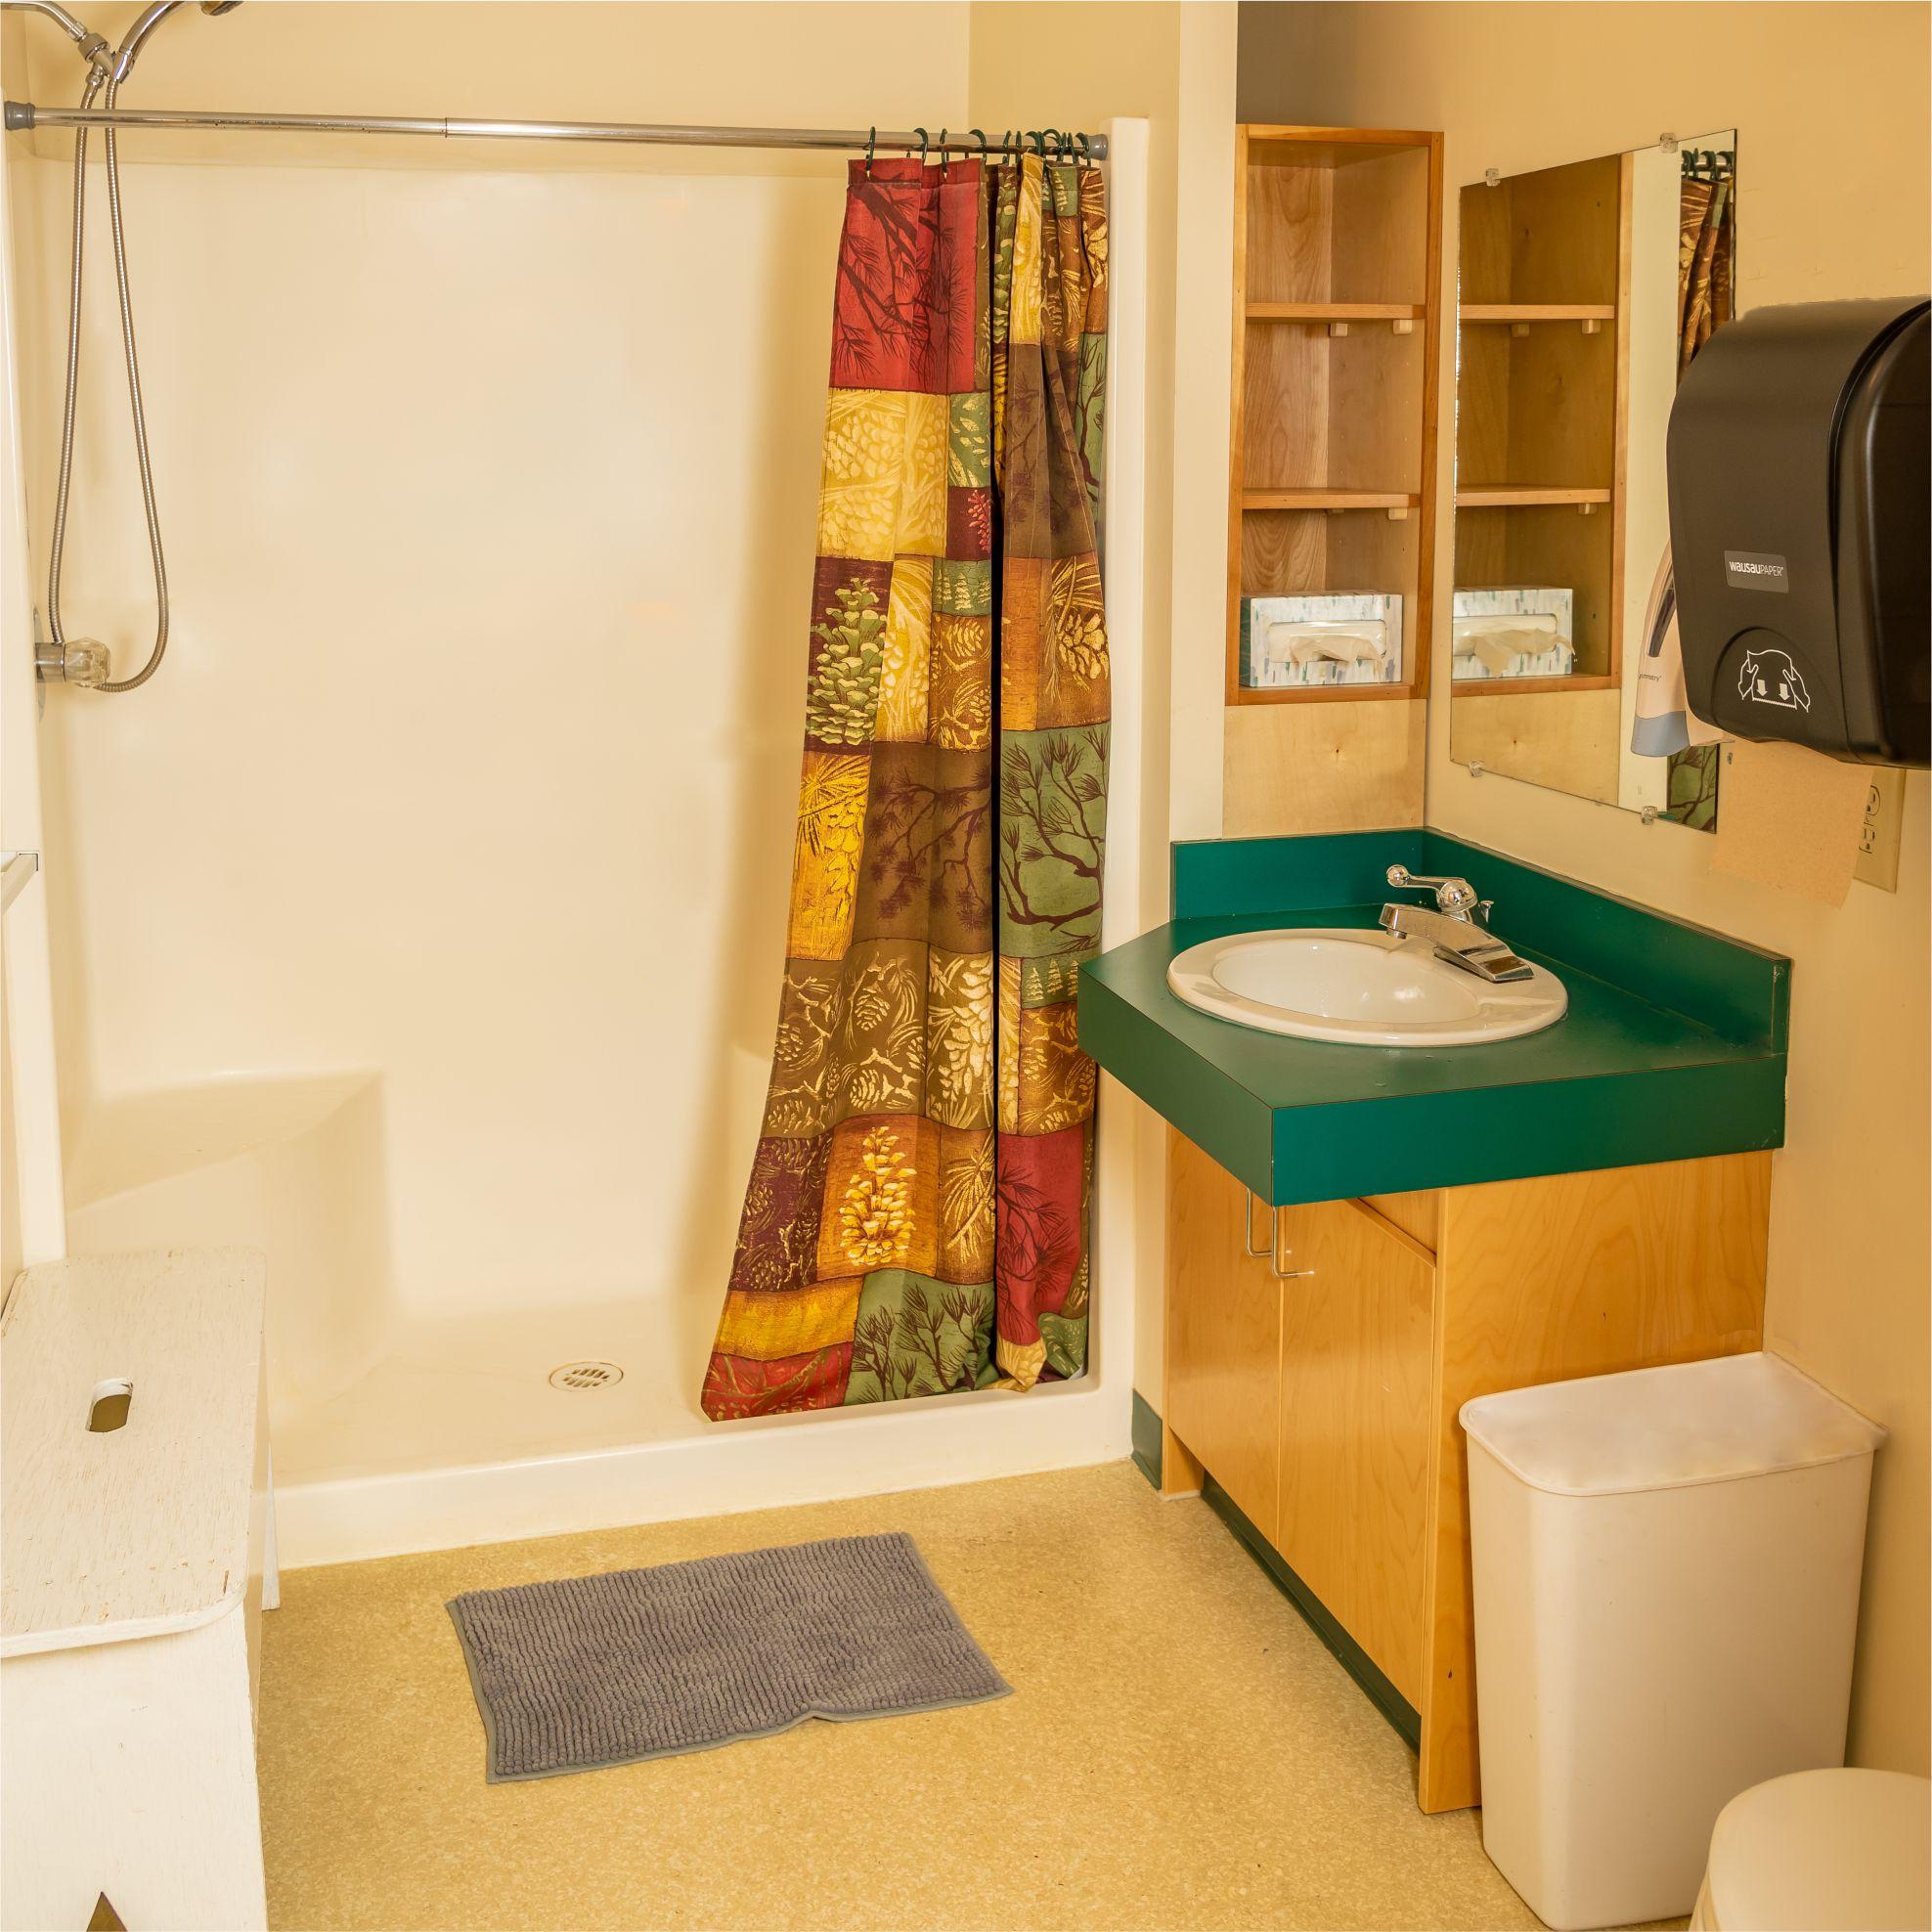 An image of the indoor washroom at Island Lake!